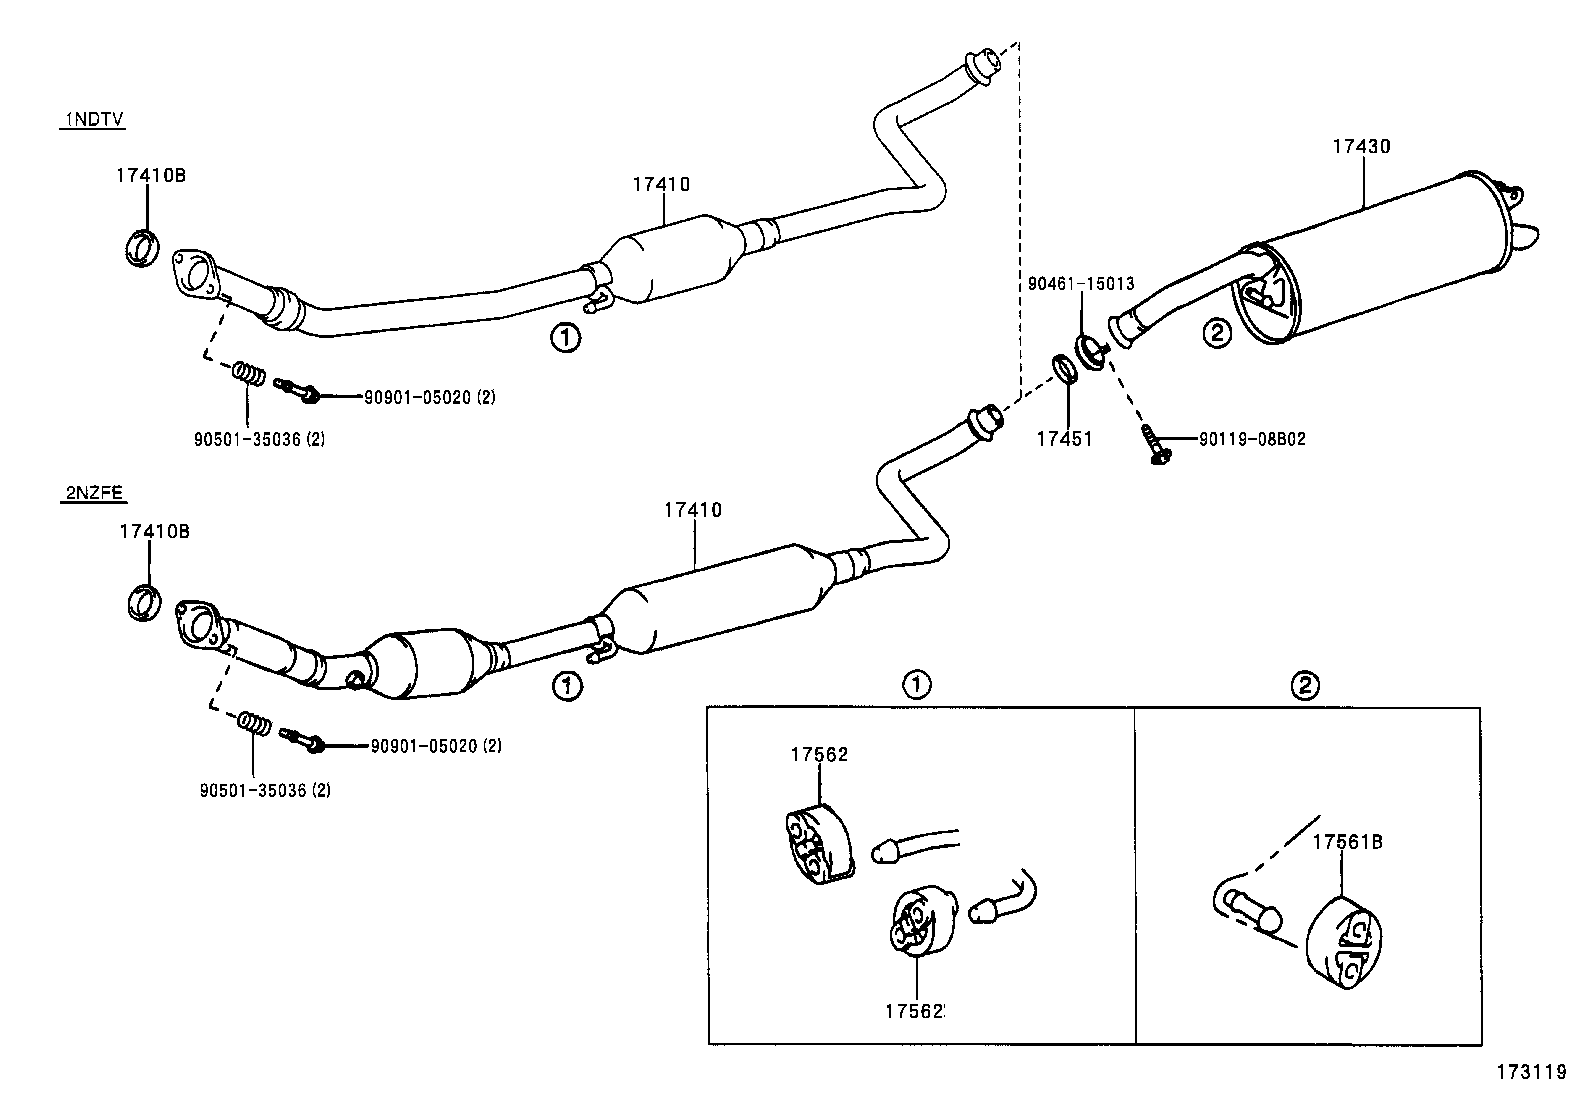 1963 chevy impala wiring diagram fuel html